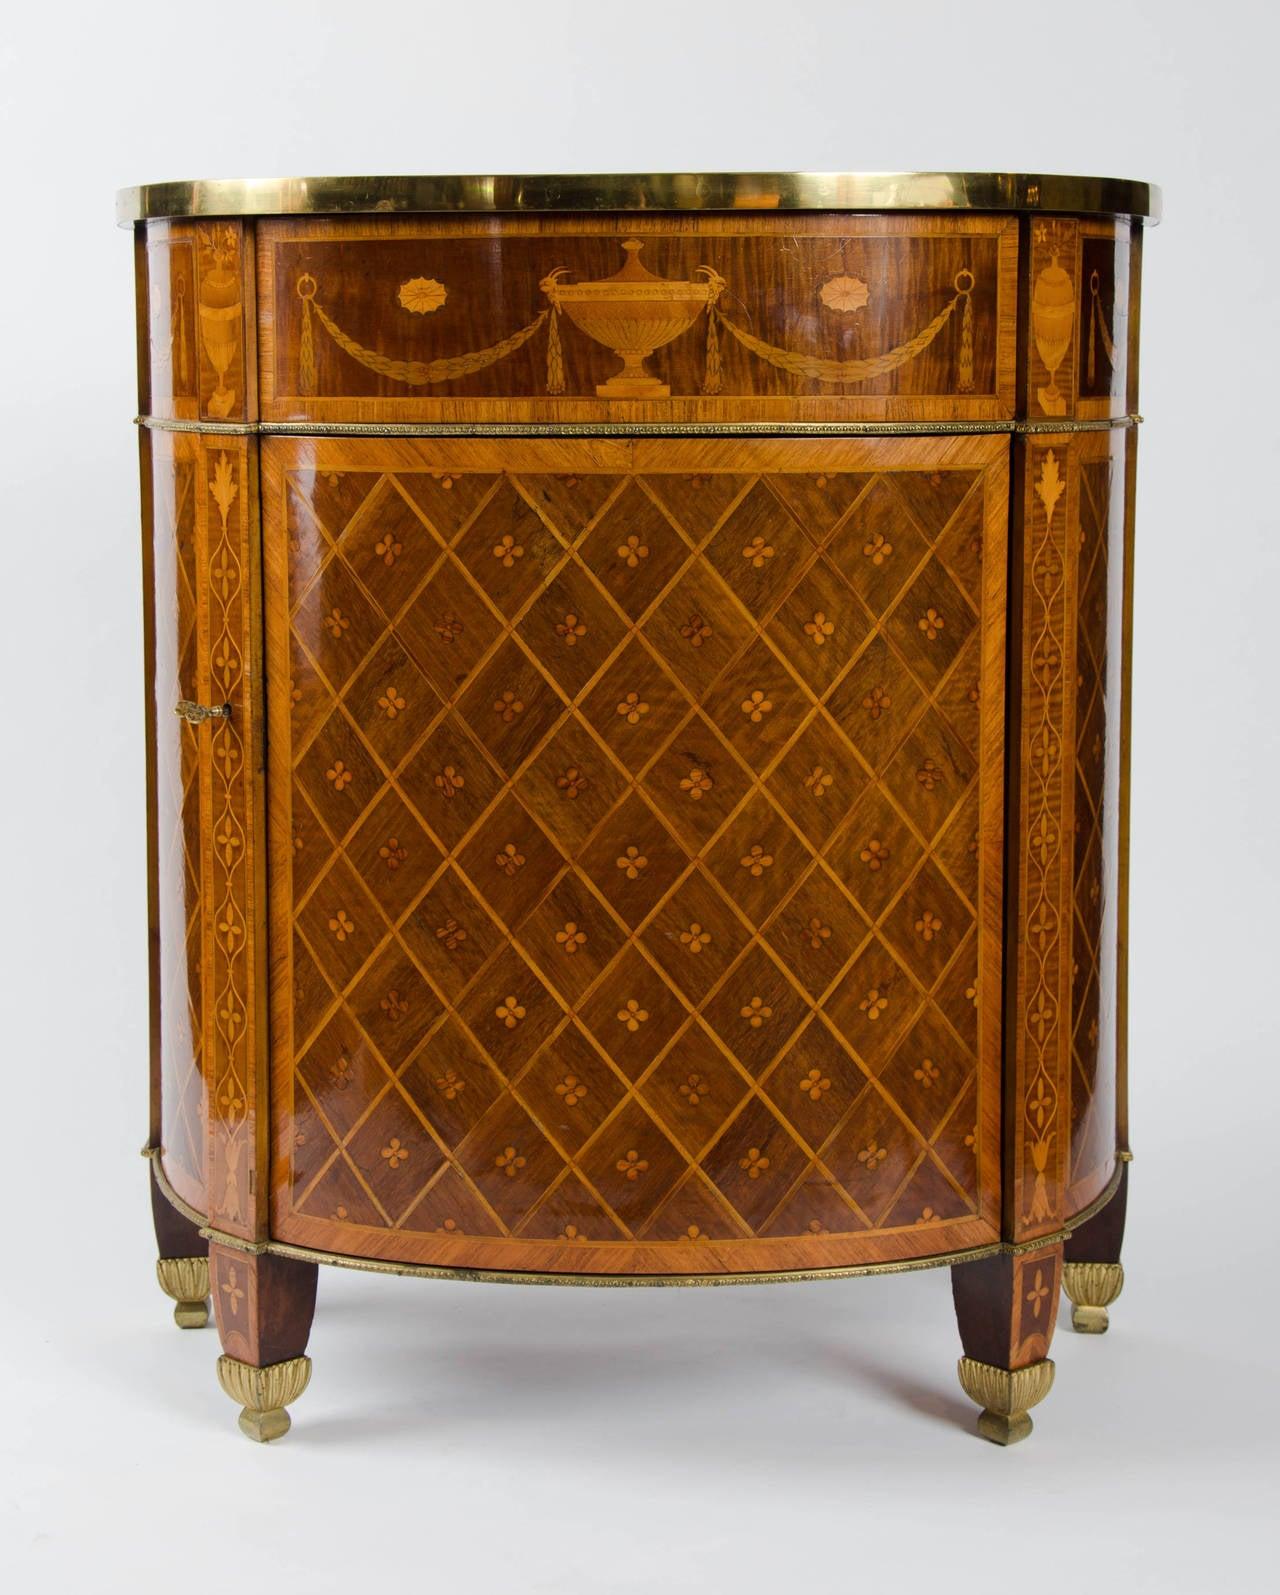 George III 18th Century Georgian Demi-Lune Commode of Satinwood, Tulipwood and Harewood For Sale